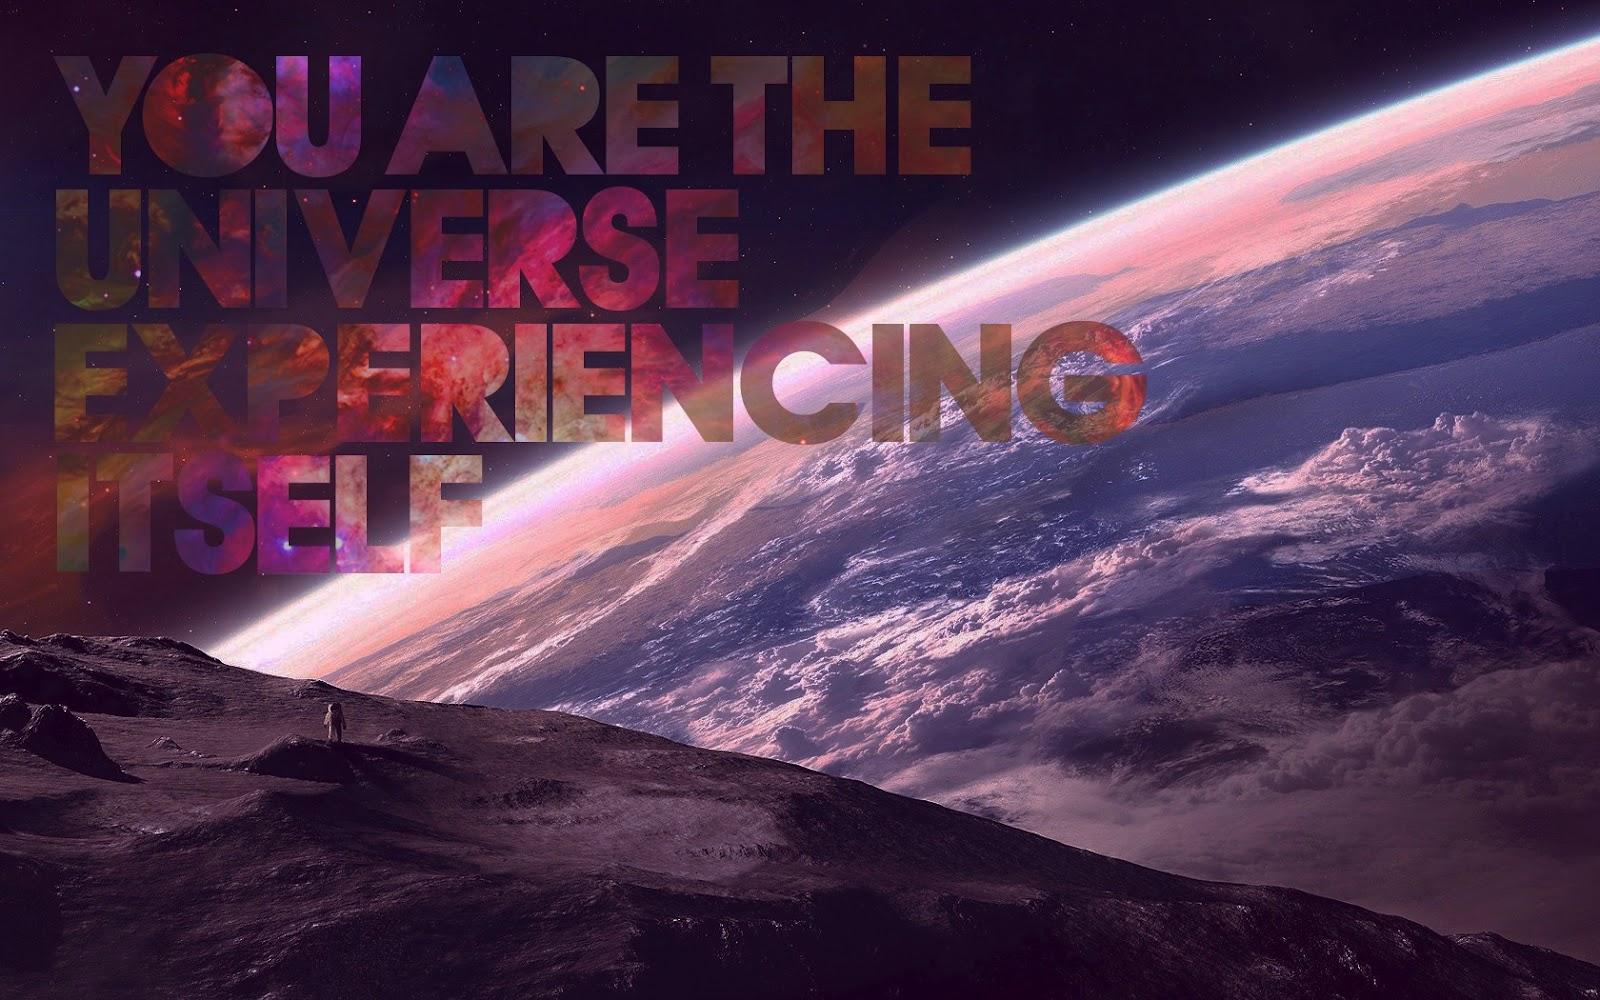 http://2.bp.blogspot.com/-EE37PKsHIS8/UDNbTW0C-XI/AAAAAAAAHHY/-ZBLgALuFJ8/s1600/space-wallpaper.jpg